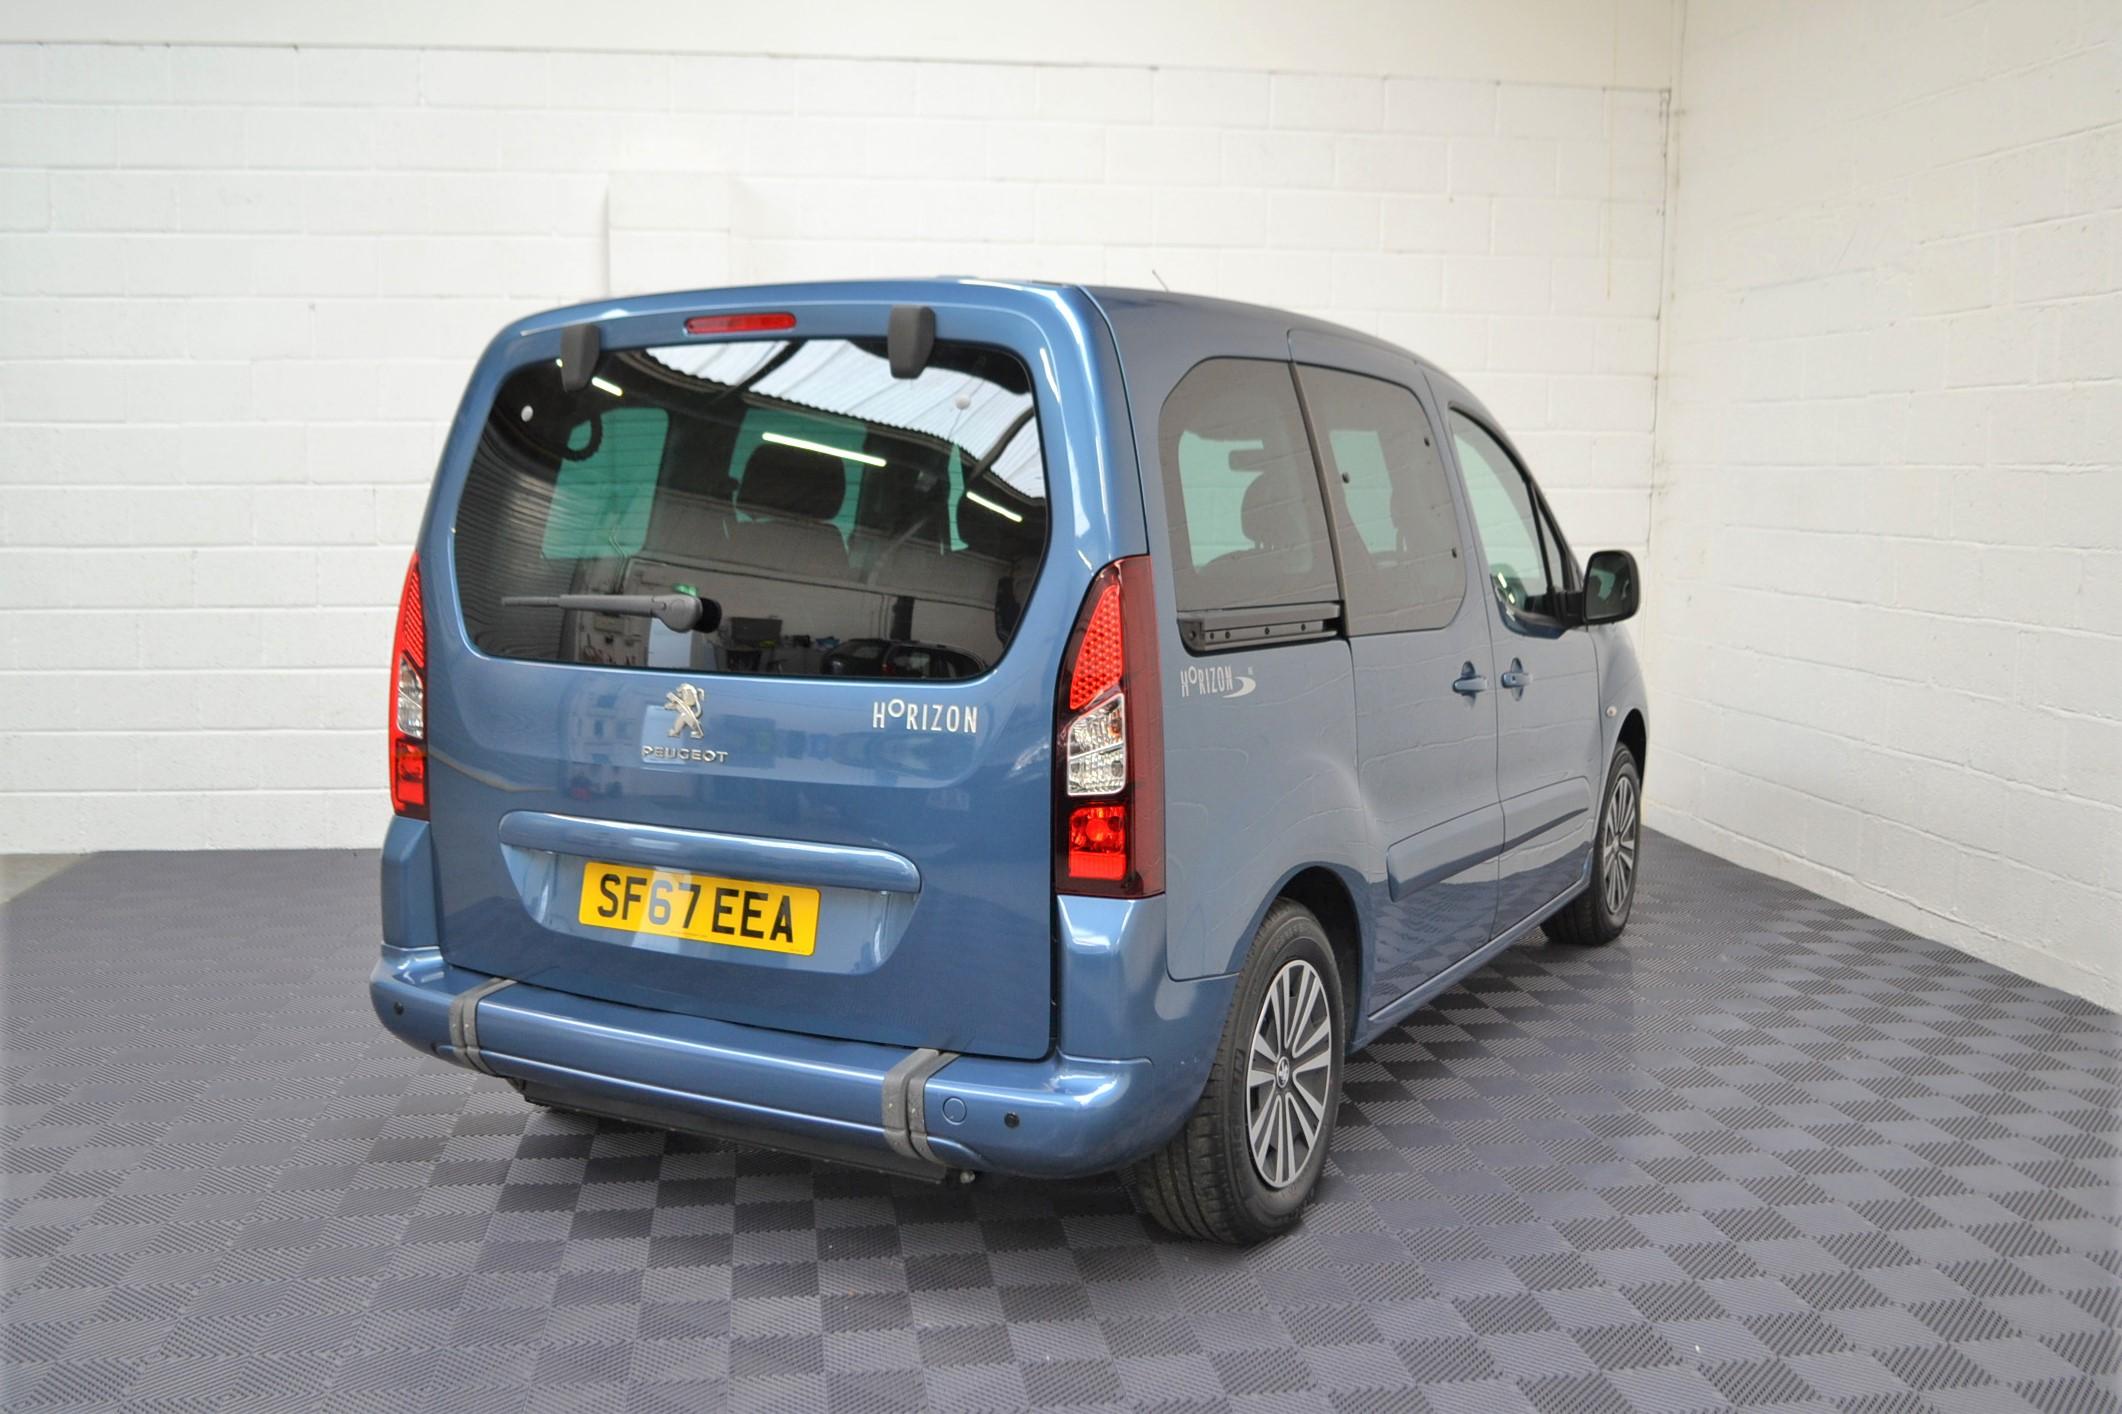 WAV Cars For Sale Bristol Wheelchair Accessible Vehicles Used For Sale Somerset Devon Dorset Bath Peugeot Partner SF67 EEA 11